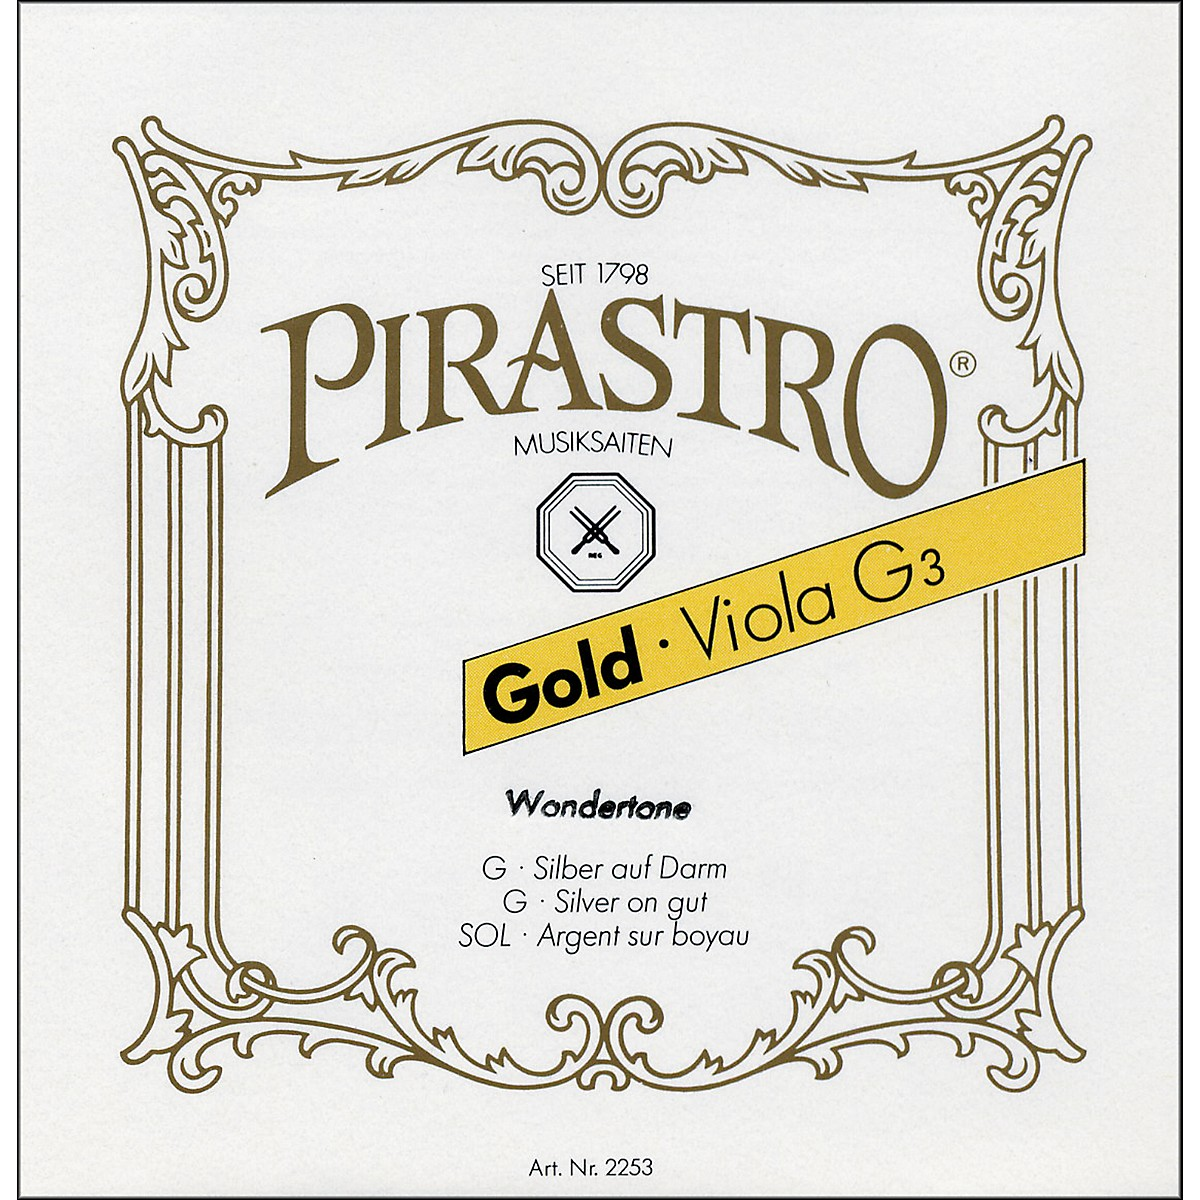 Pirastro Wondertone Gold Label Series Viola D String